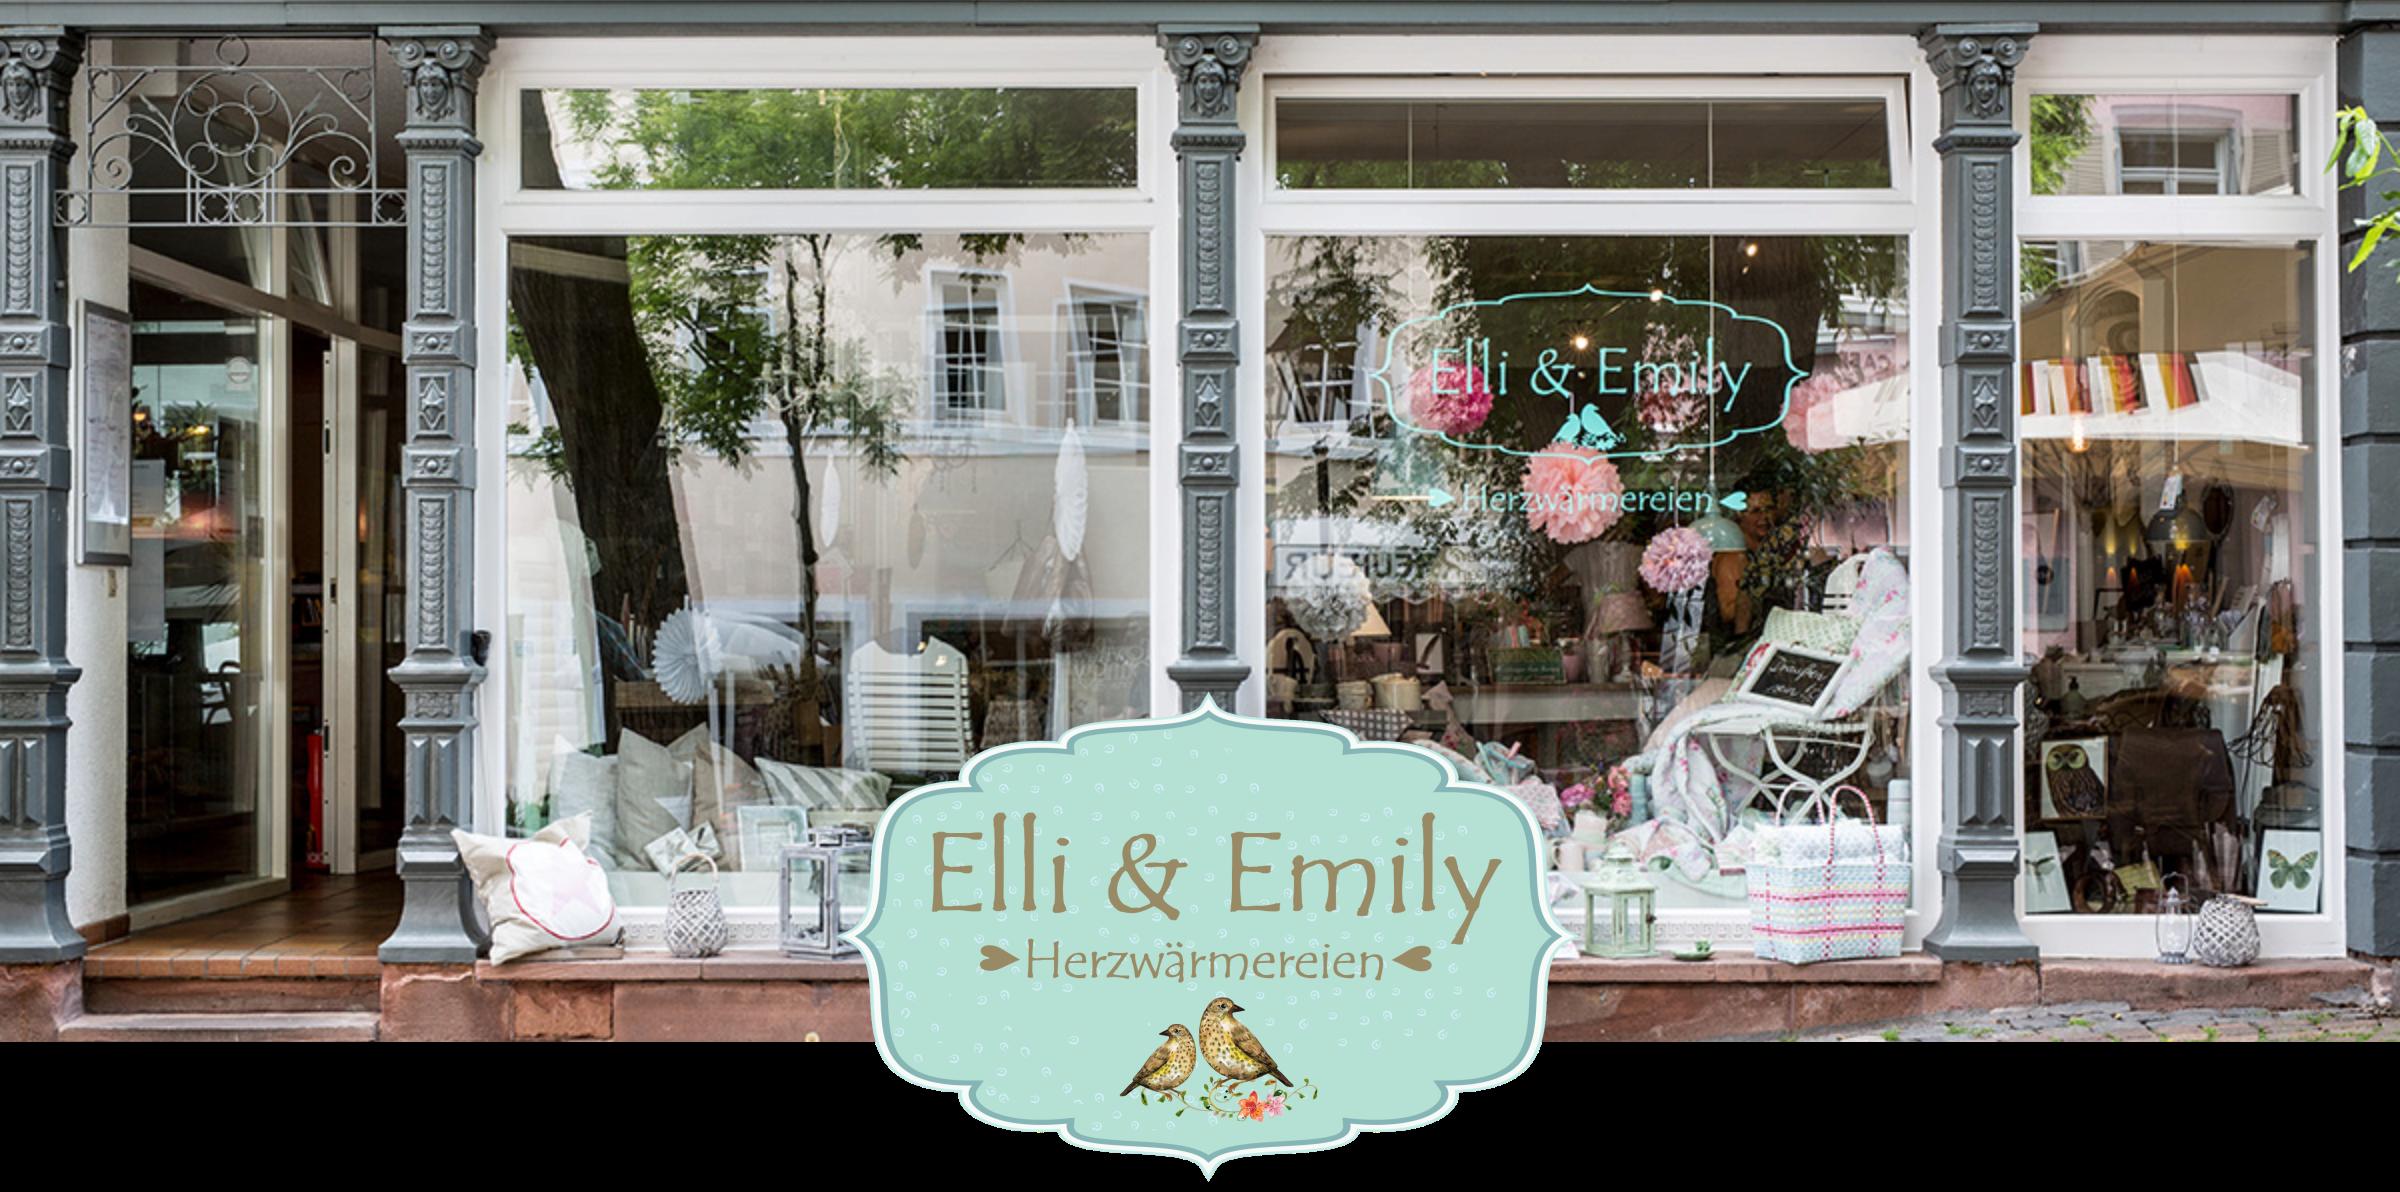 Elli & Emily